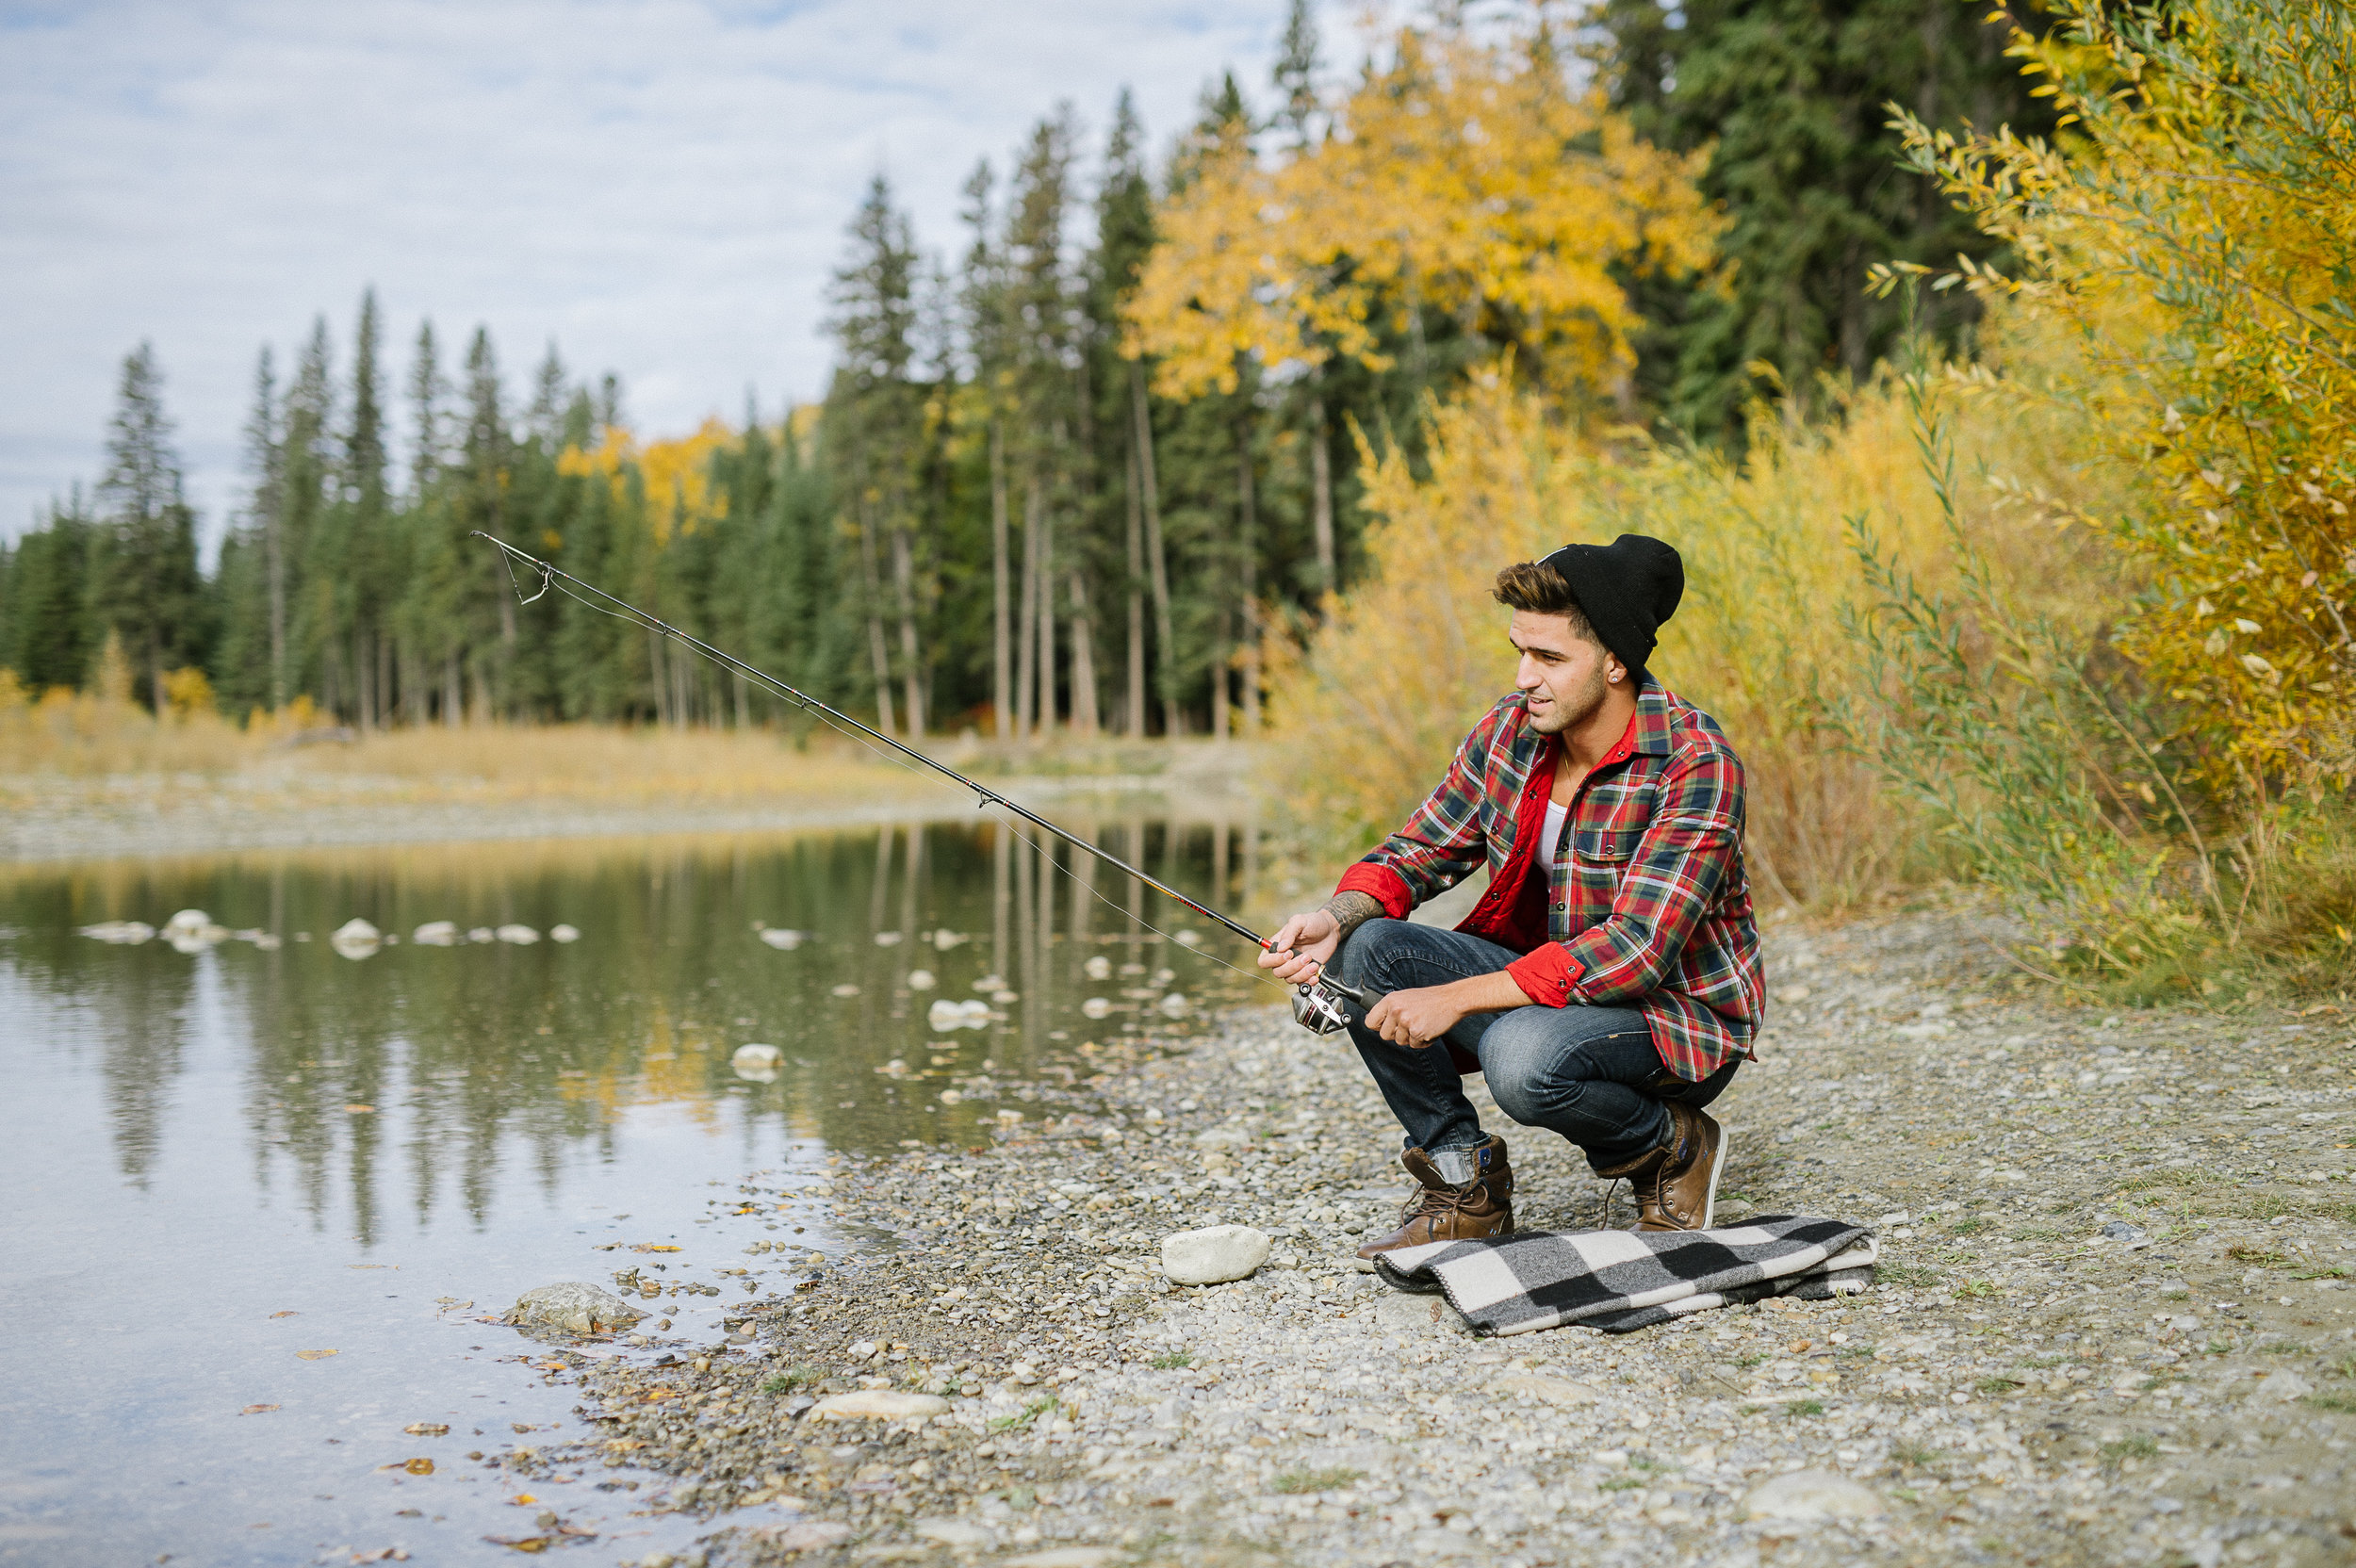 Calgary_Boudoir_Photography_Hello_There_Darling_Victor_2017_HR 0021.jpg